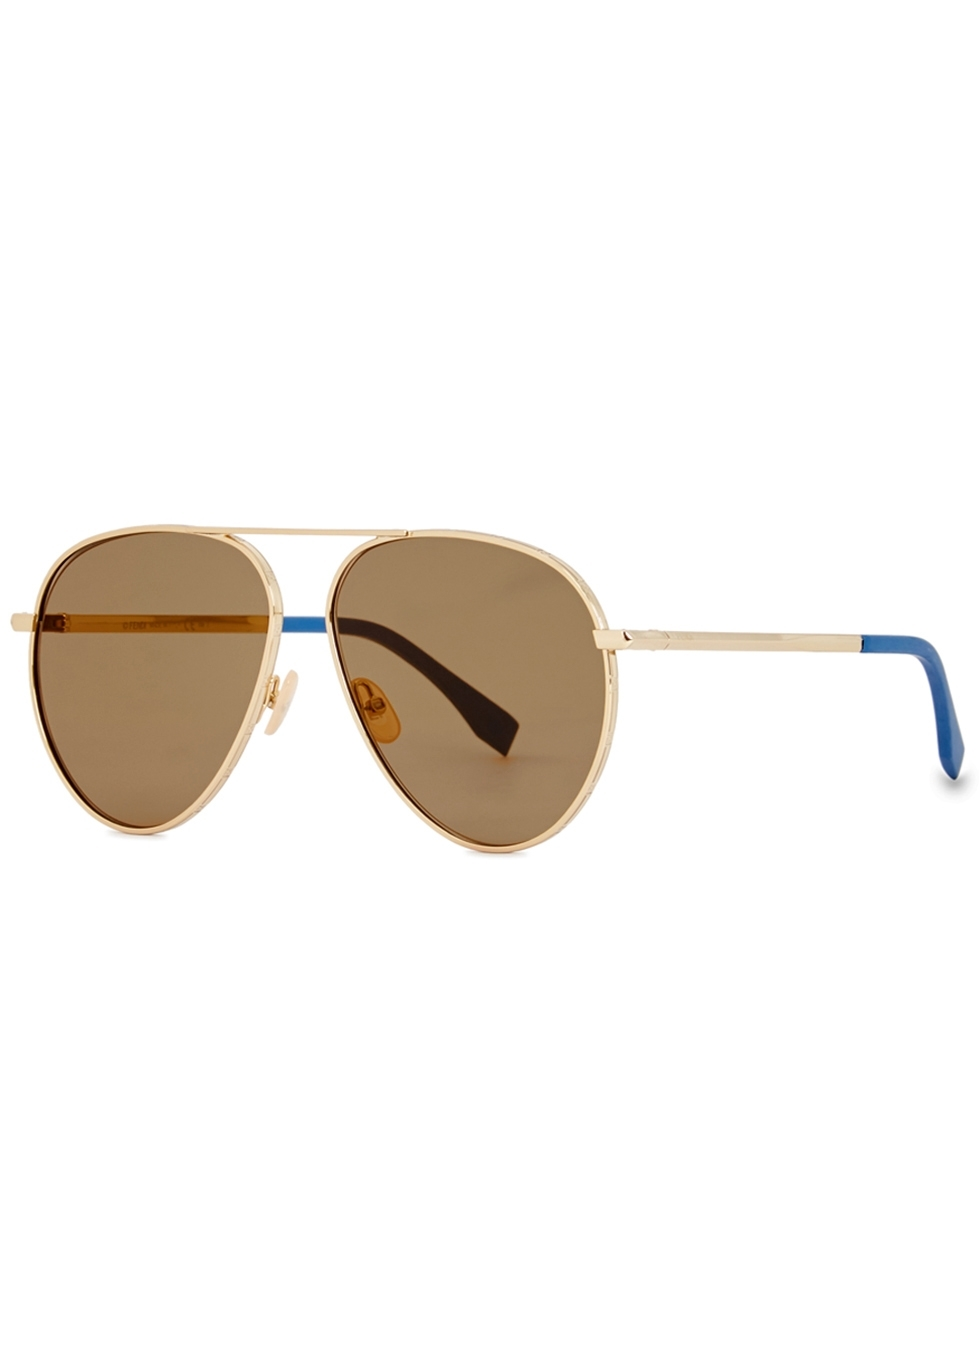 cb3ae5e010 Men s Designer Sunglasses   Eyewear - Harvey Nichols